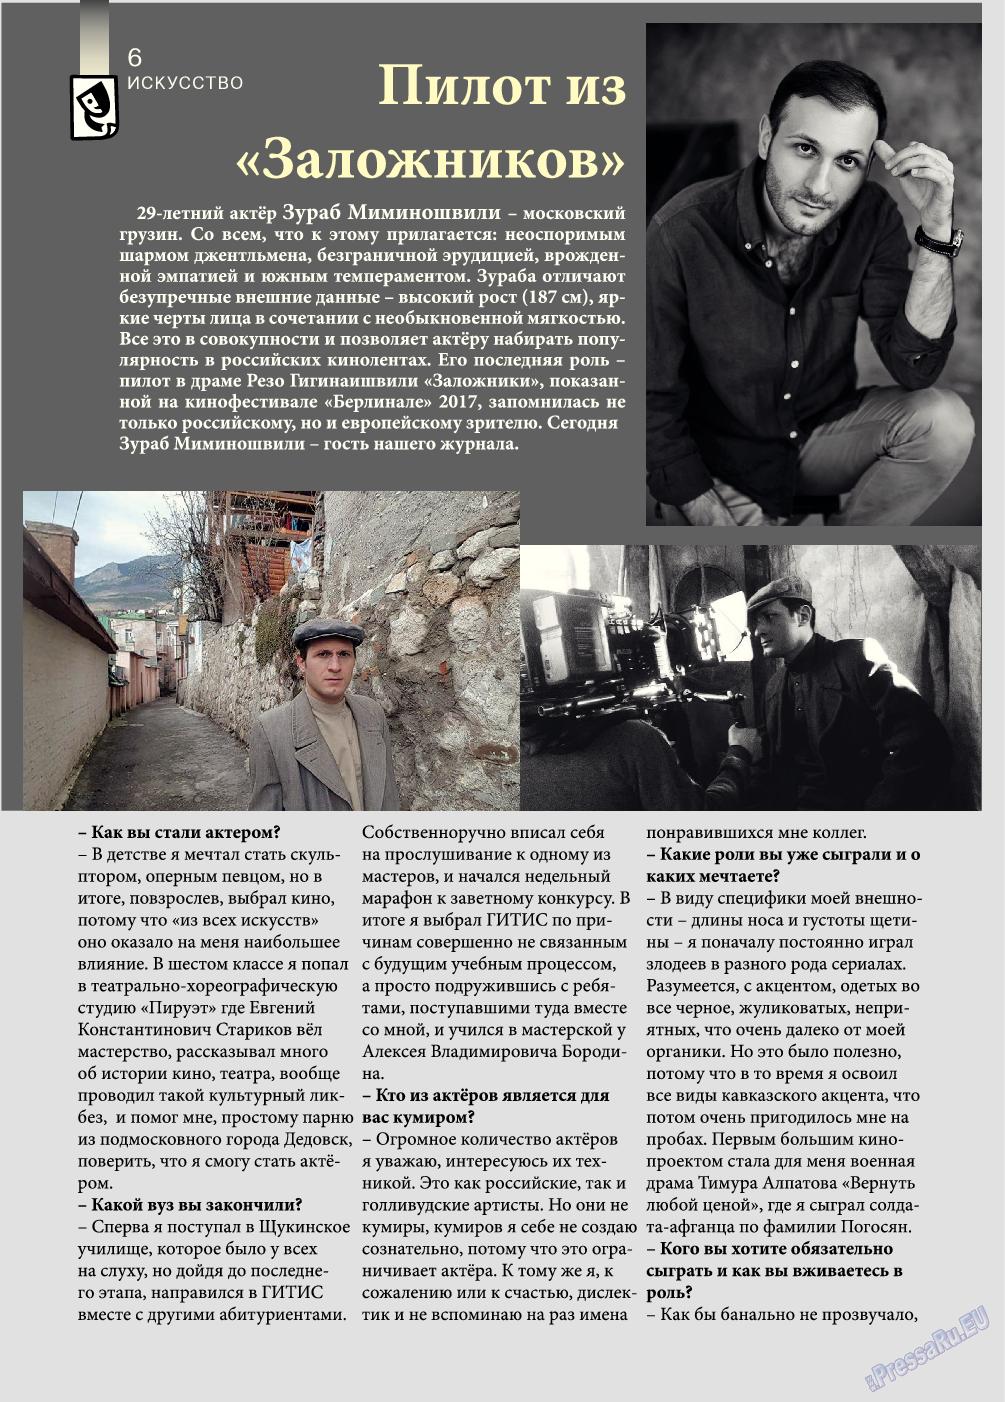 Русский Штуттгарт (журнал). 2017 год, номер 78, стр. 6